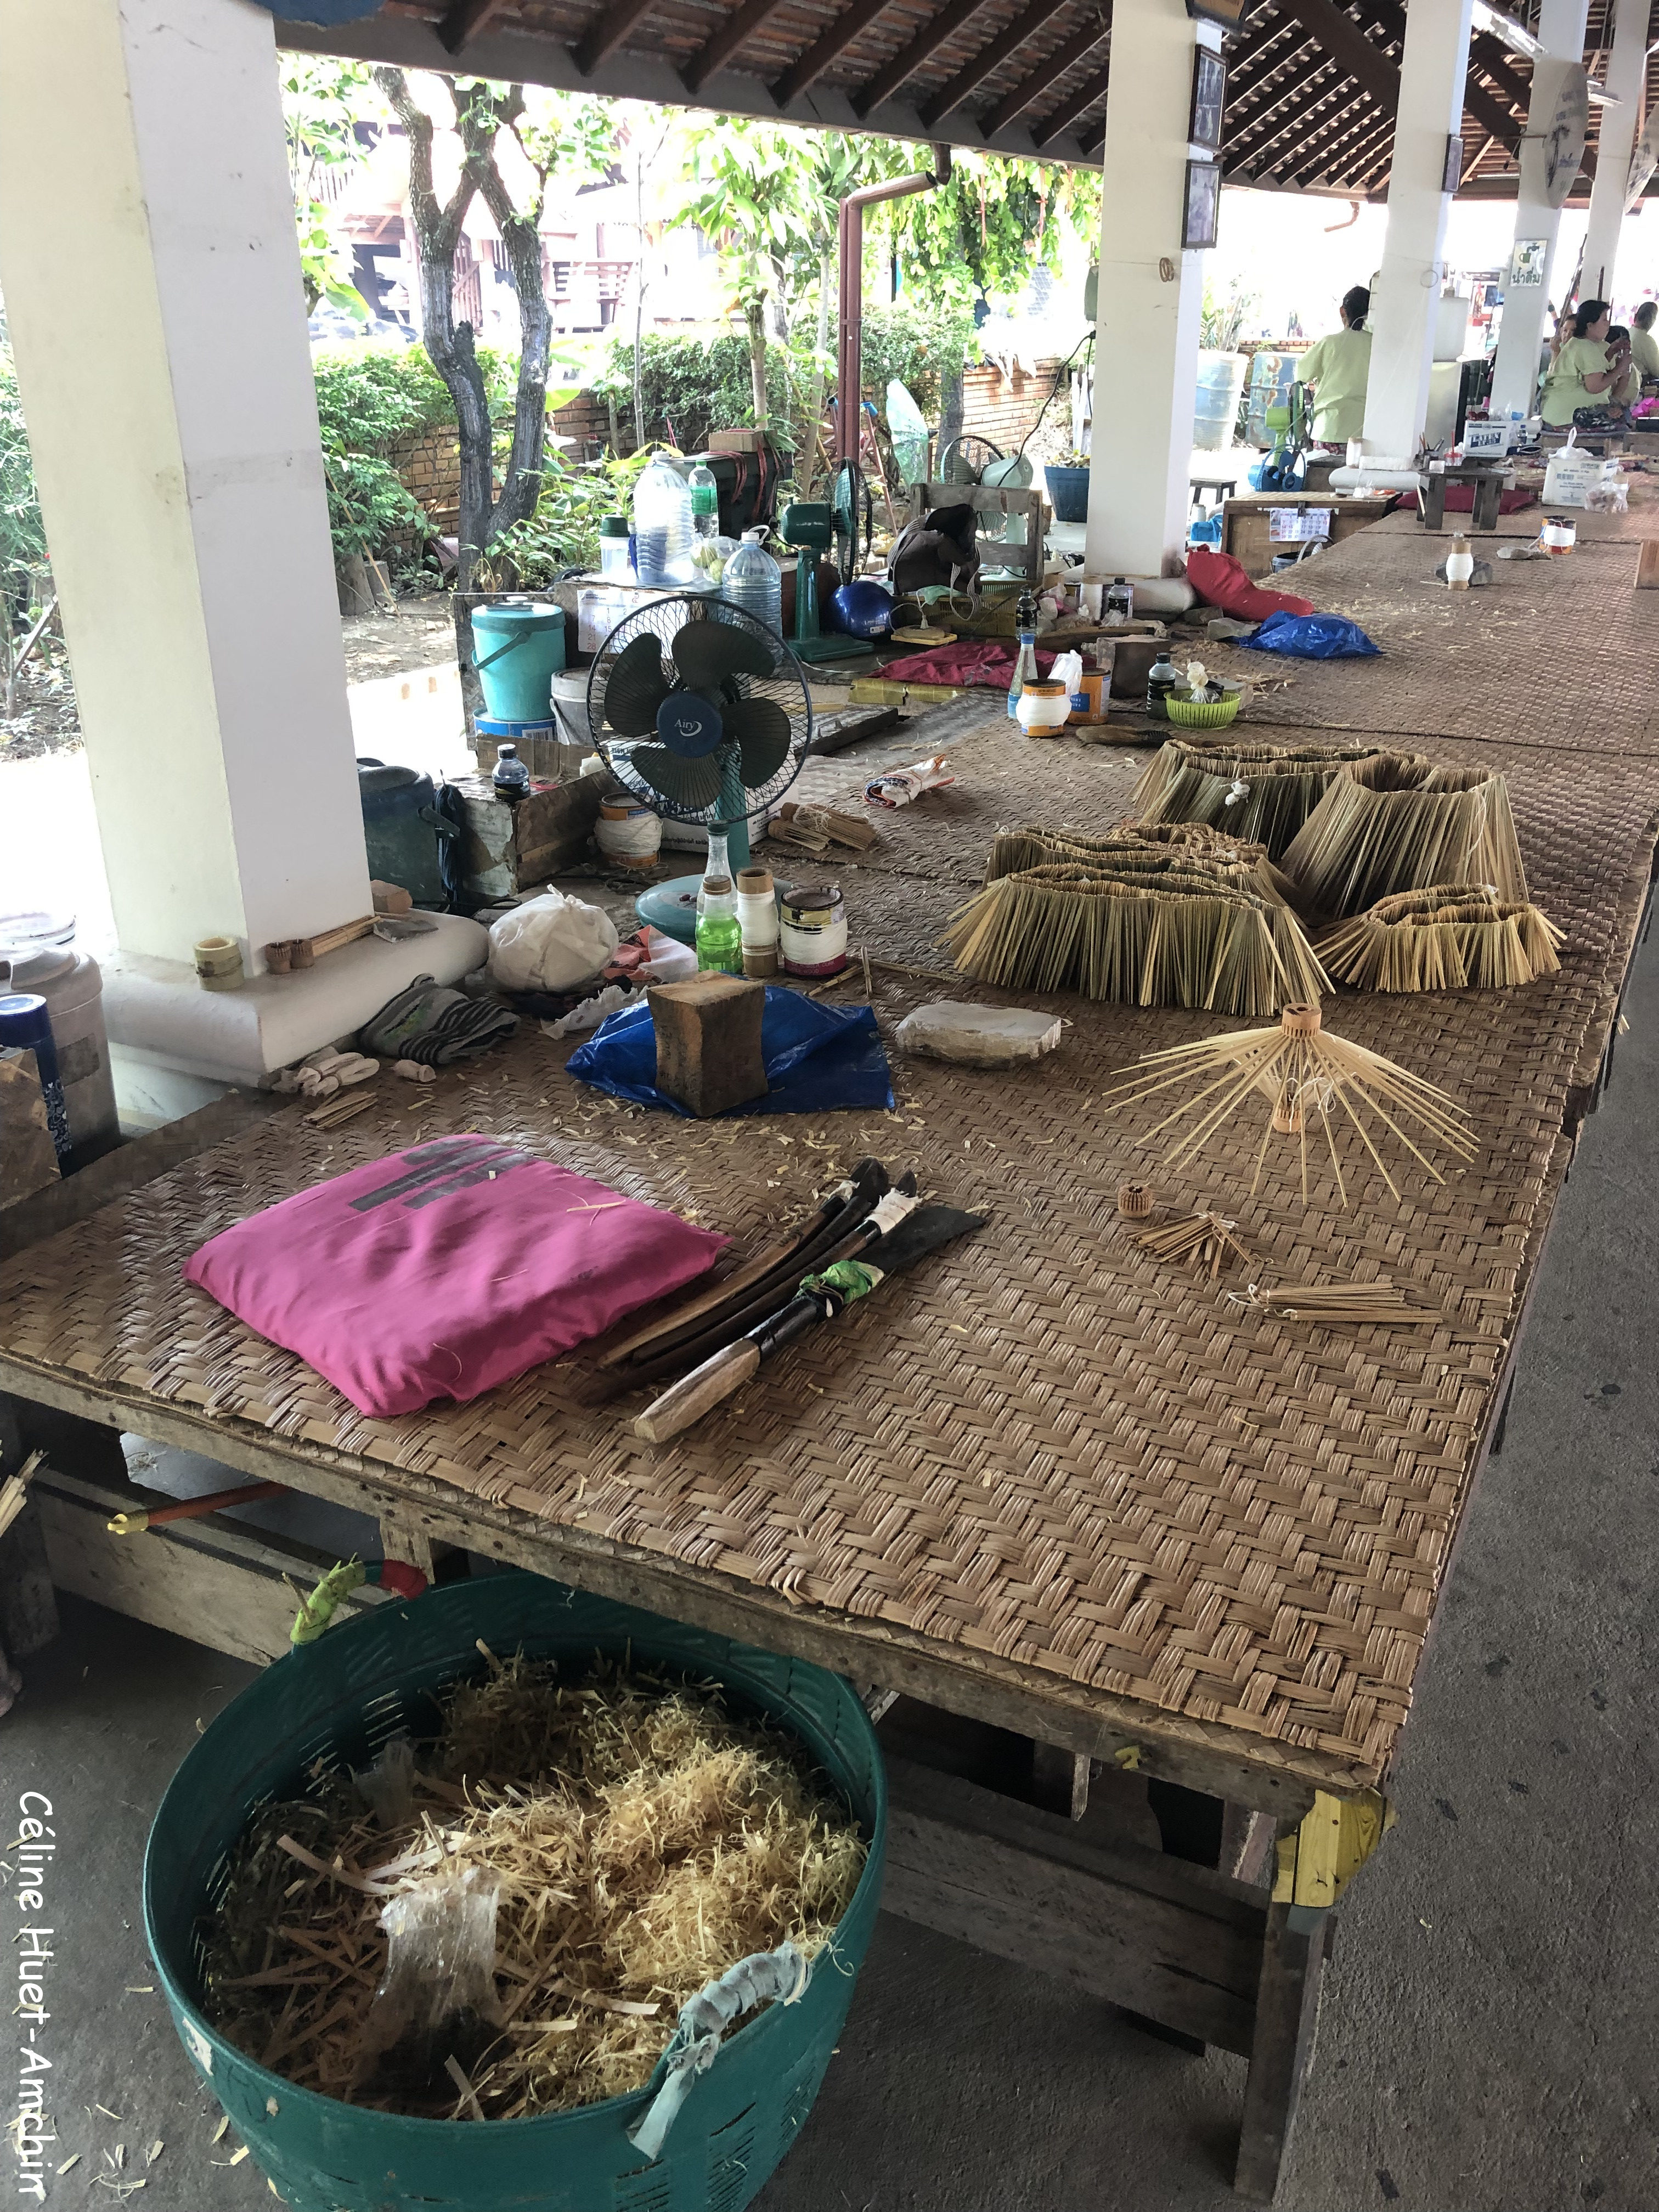 Fabrication ombrelles province de Chiang Mai Thaïlande Asie